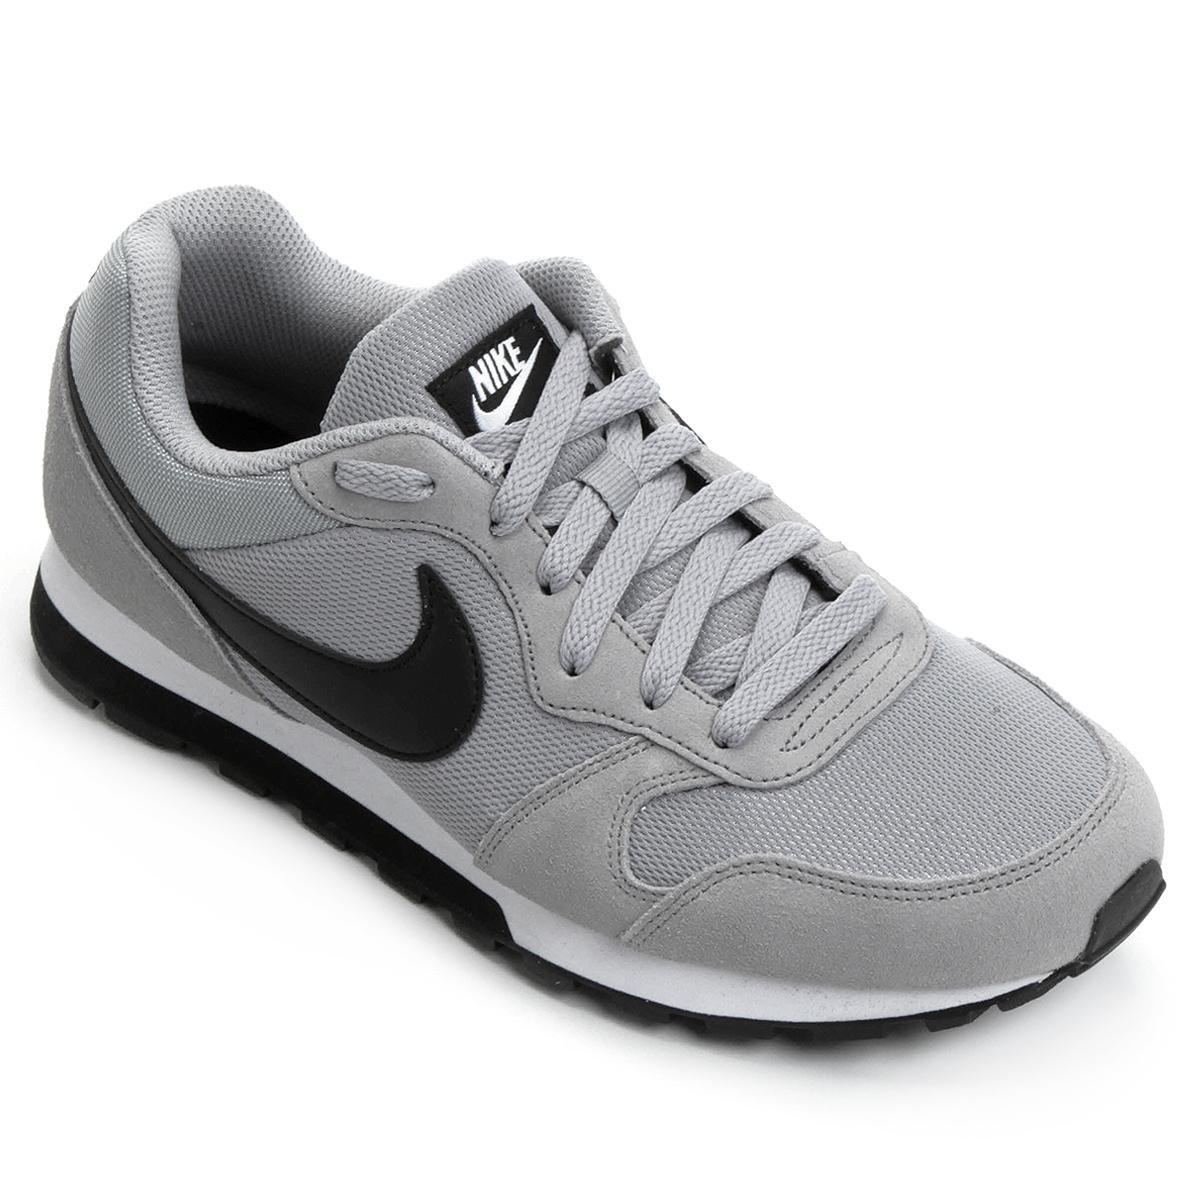 Tênis Nike Md Runner 2 Masculino - Tam: 44